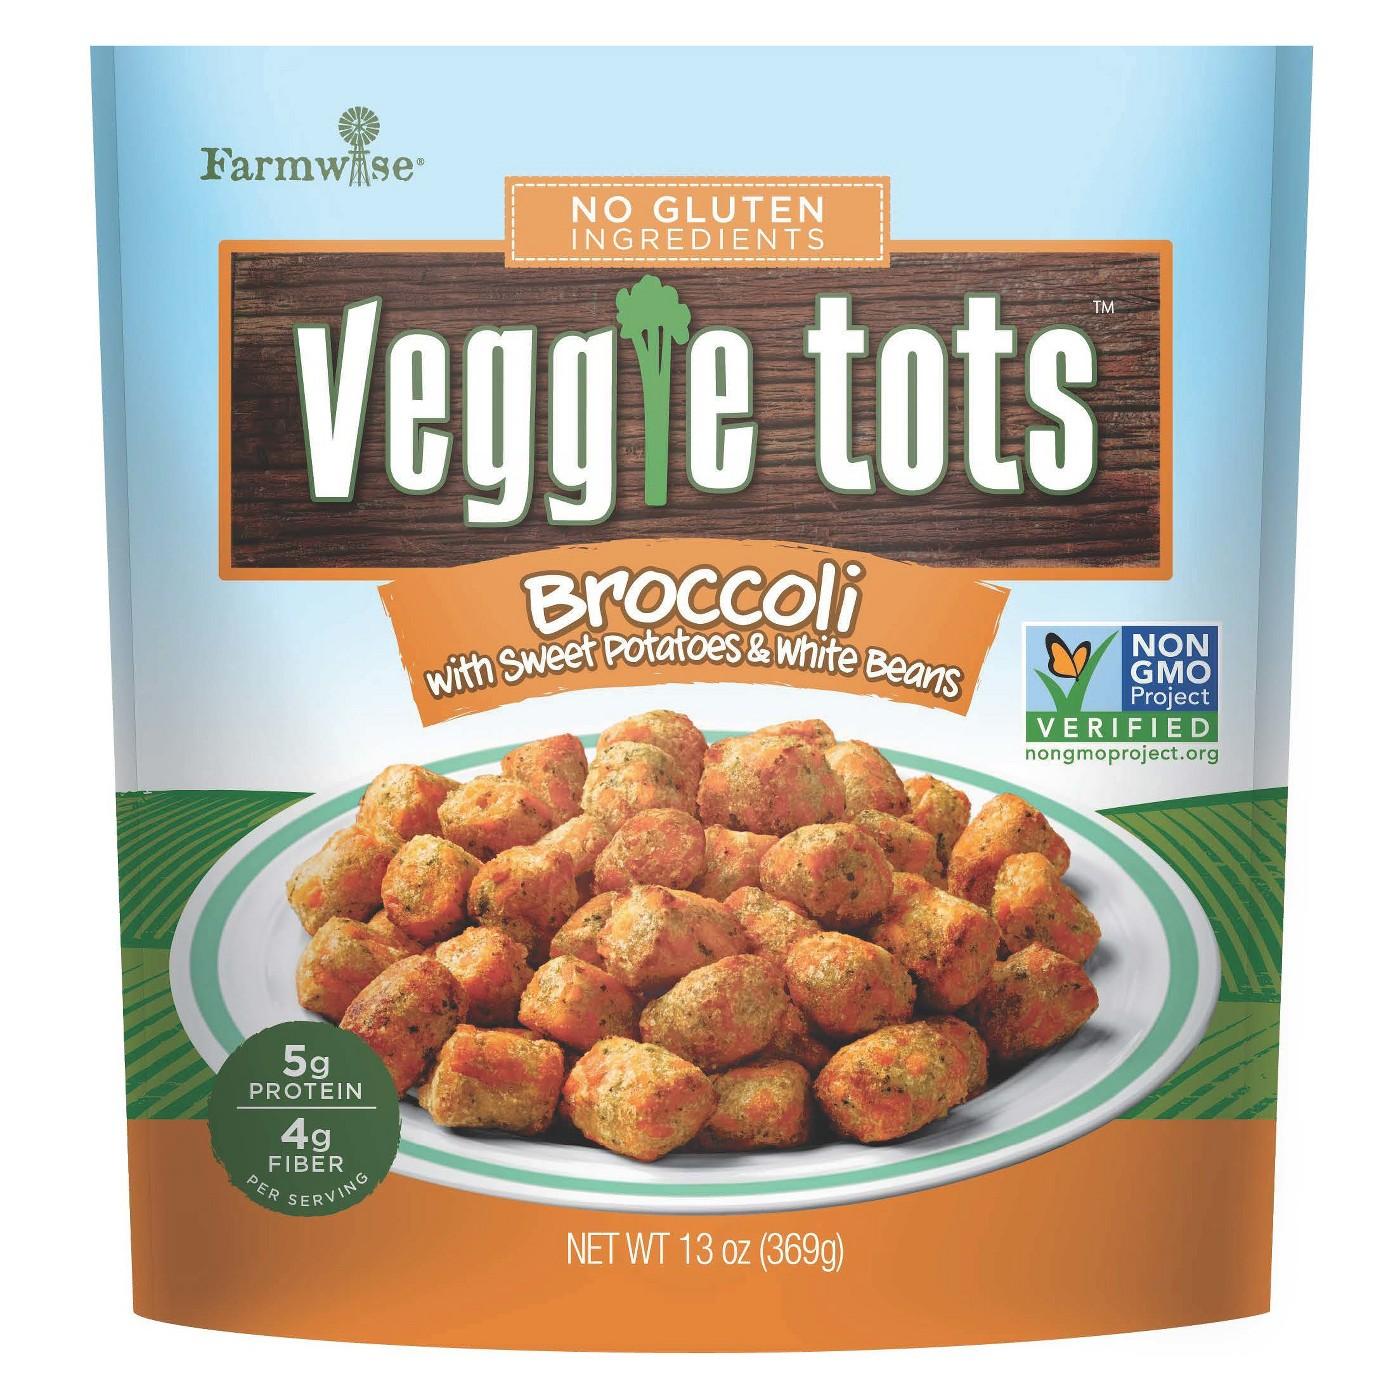 Farmwise Frozen Broccoli & Sweet Potatoes Veggie Tots - 13oz - image 1 of 1